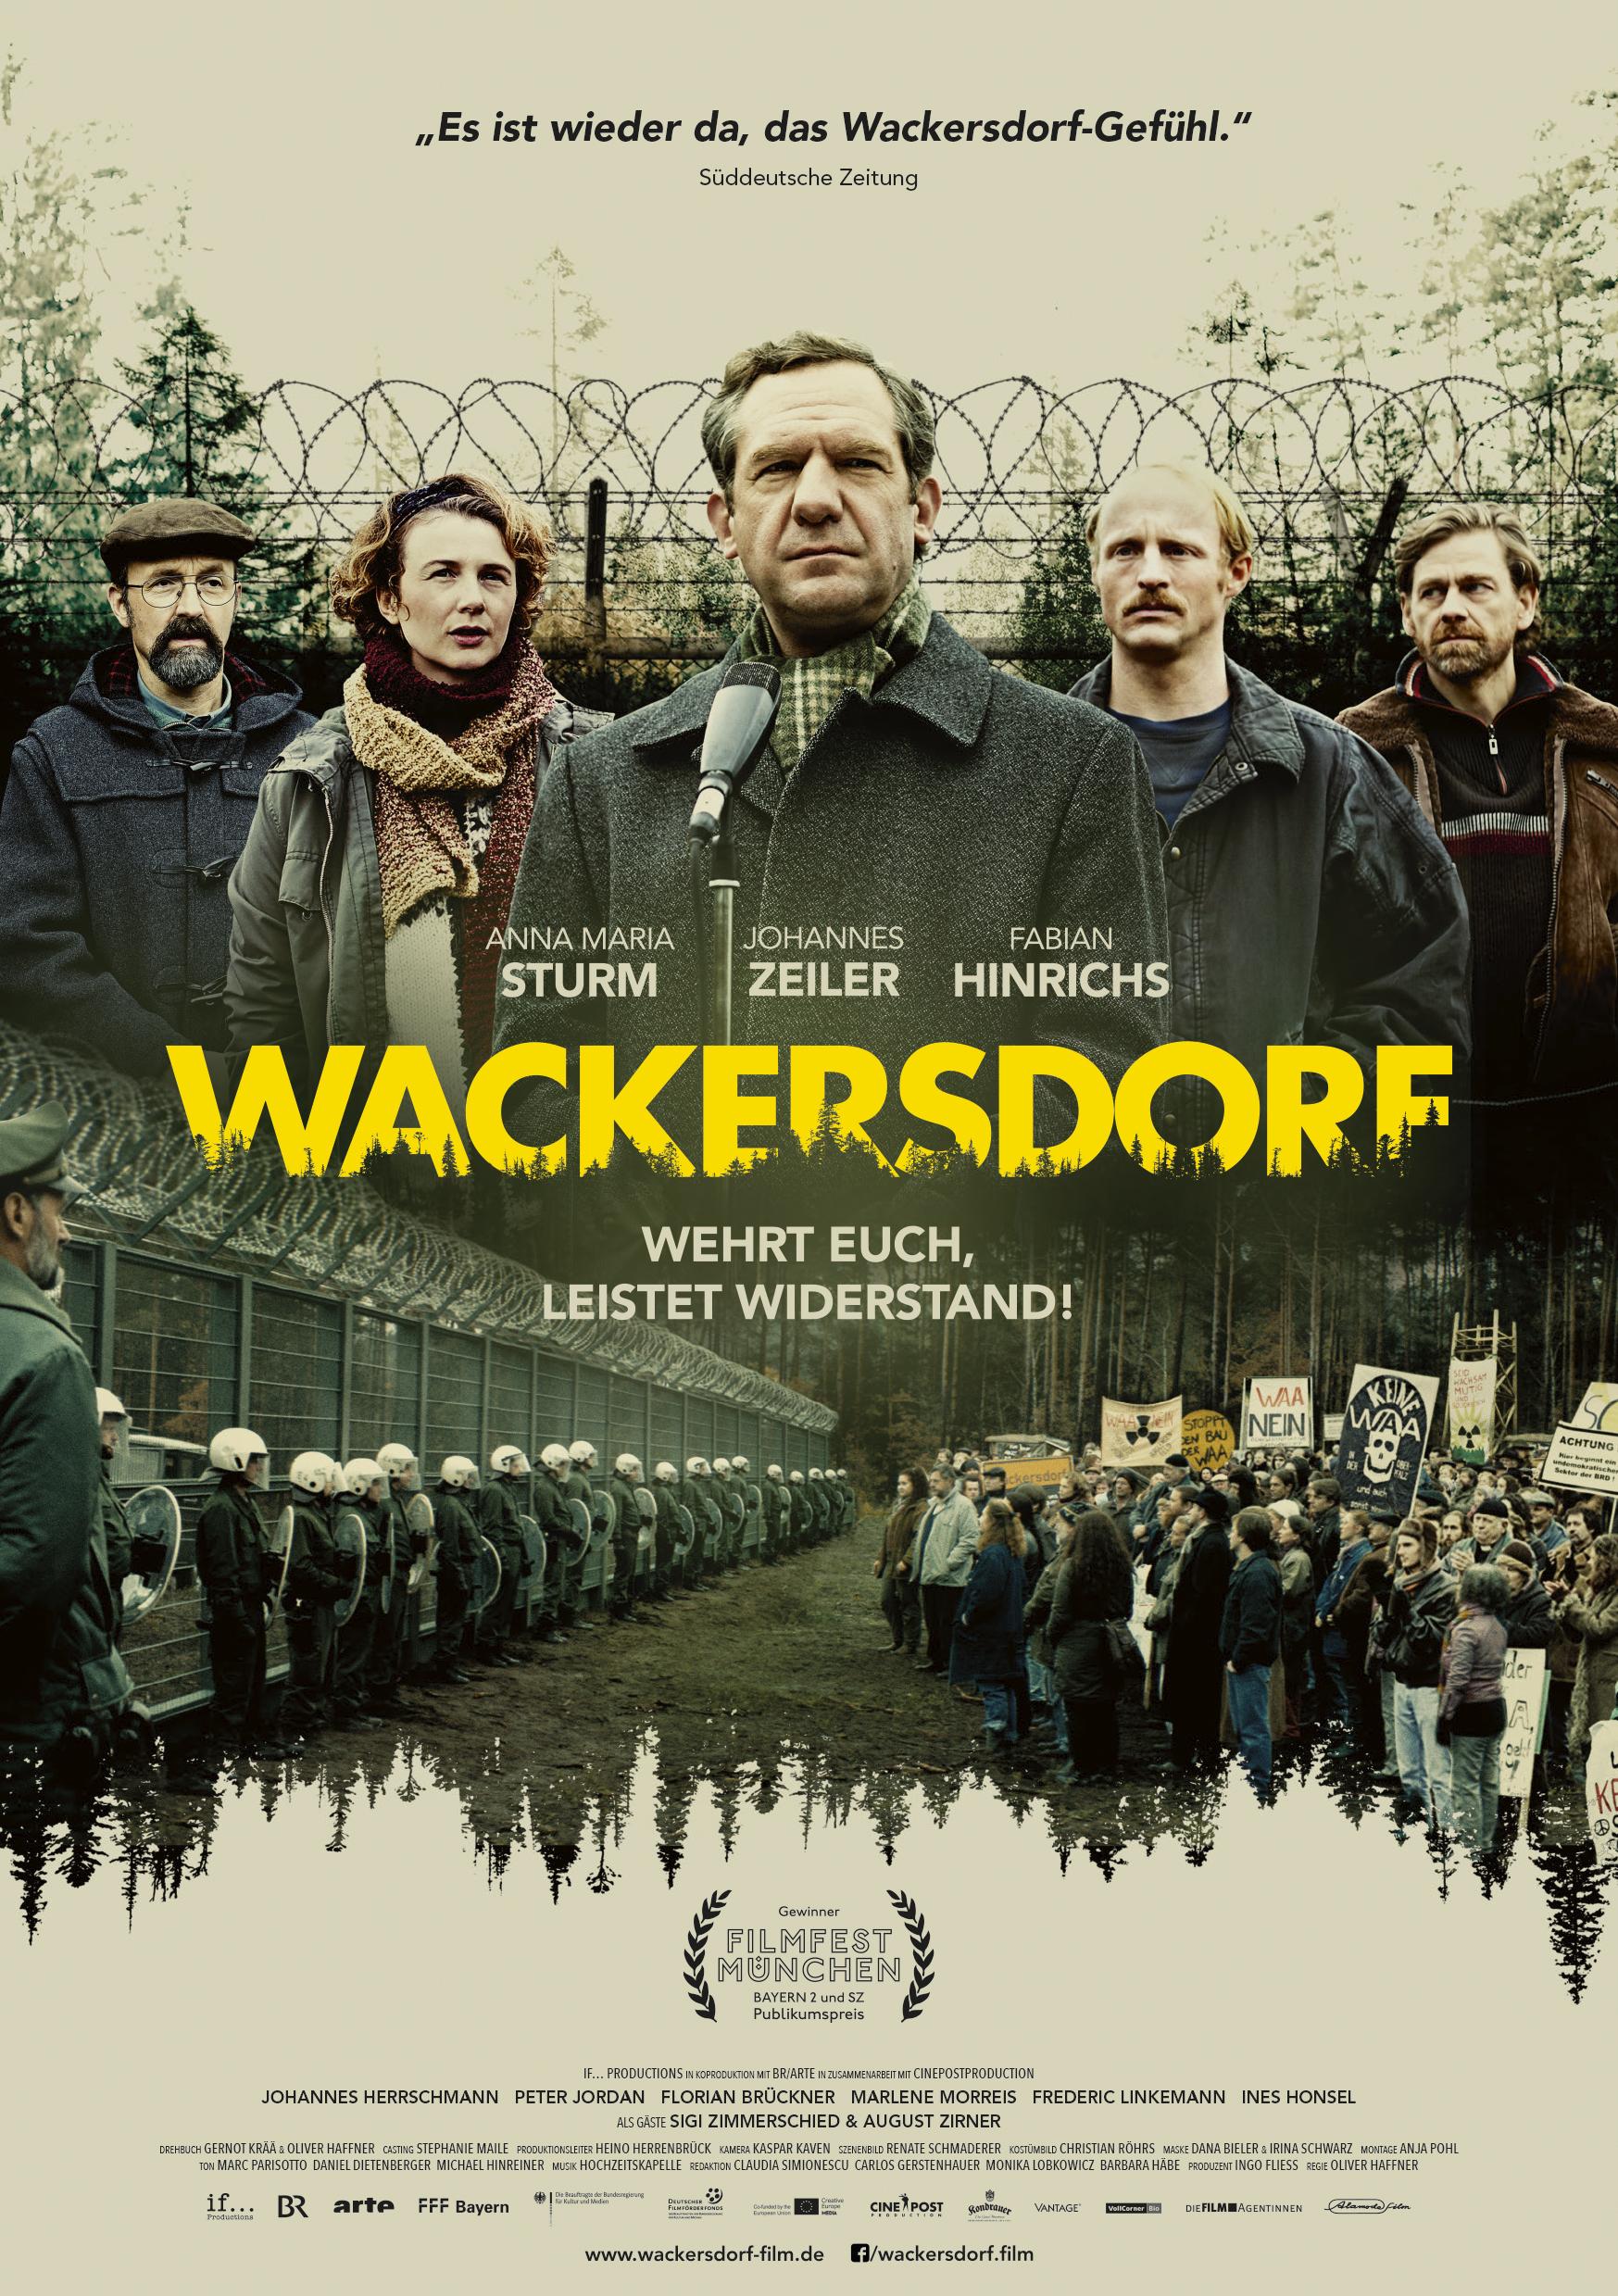 #Wackersdorf